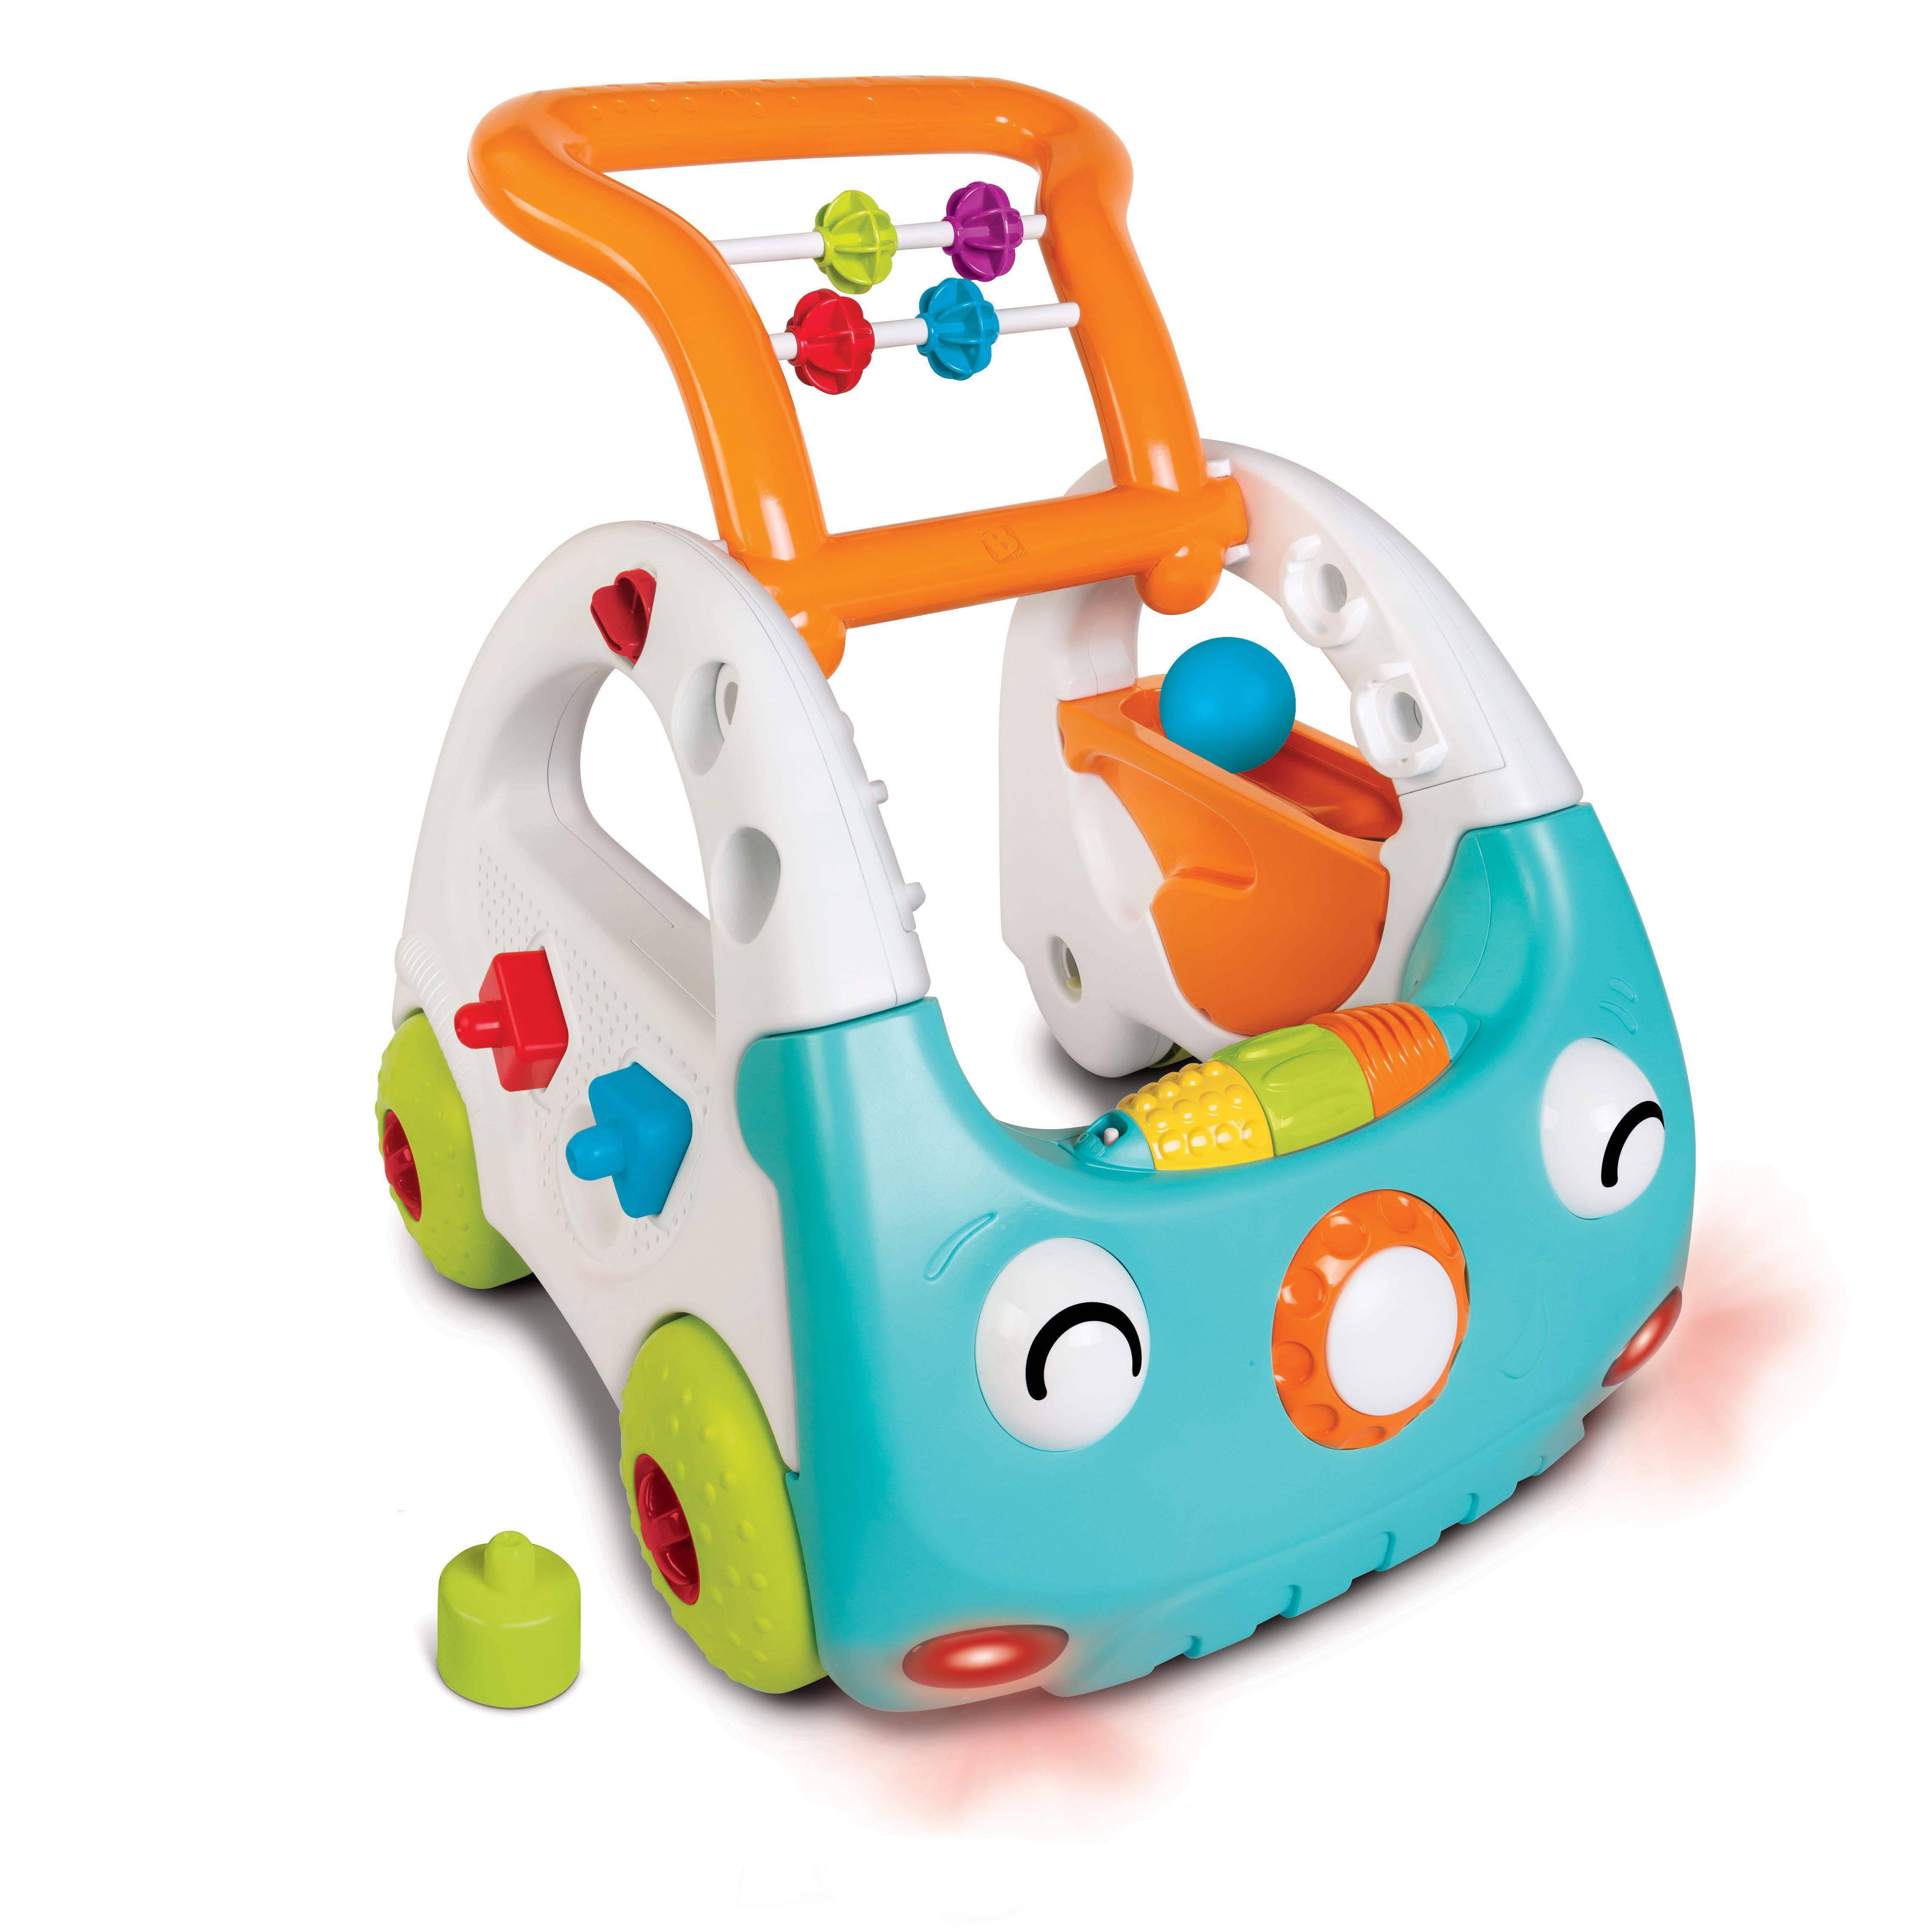 Mini Cars En 3 Trotteur BkidsAvis Infantino 1 n0ONwZ8PXk